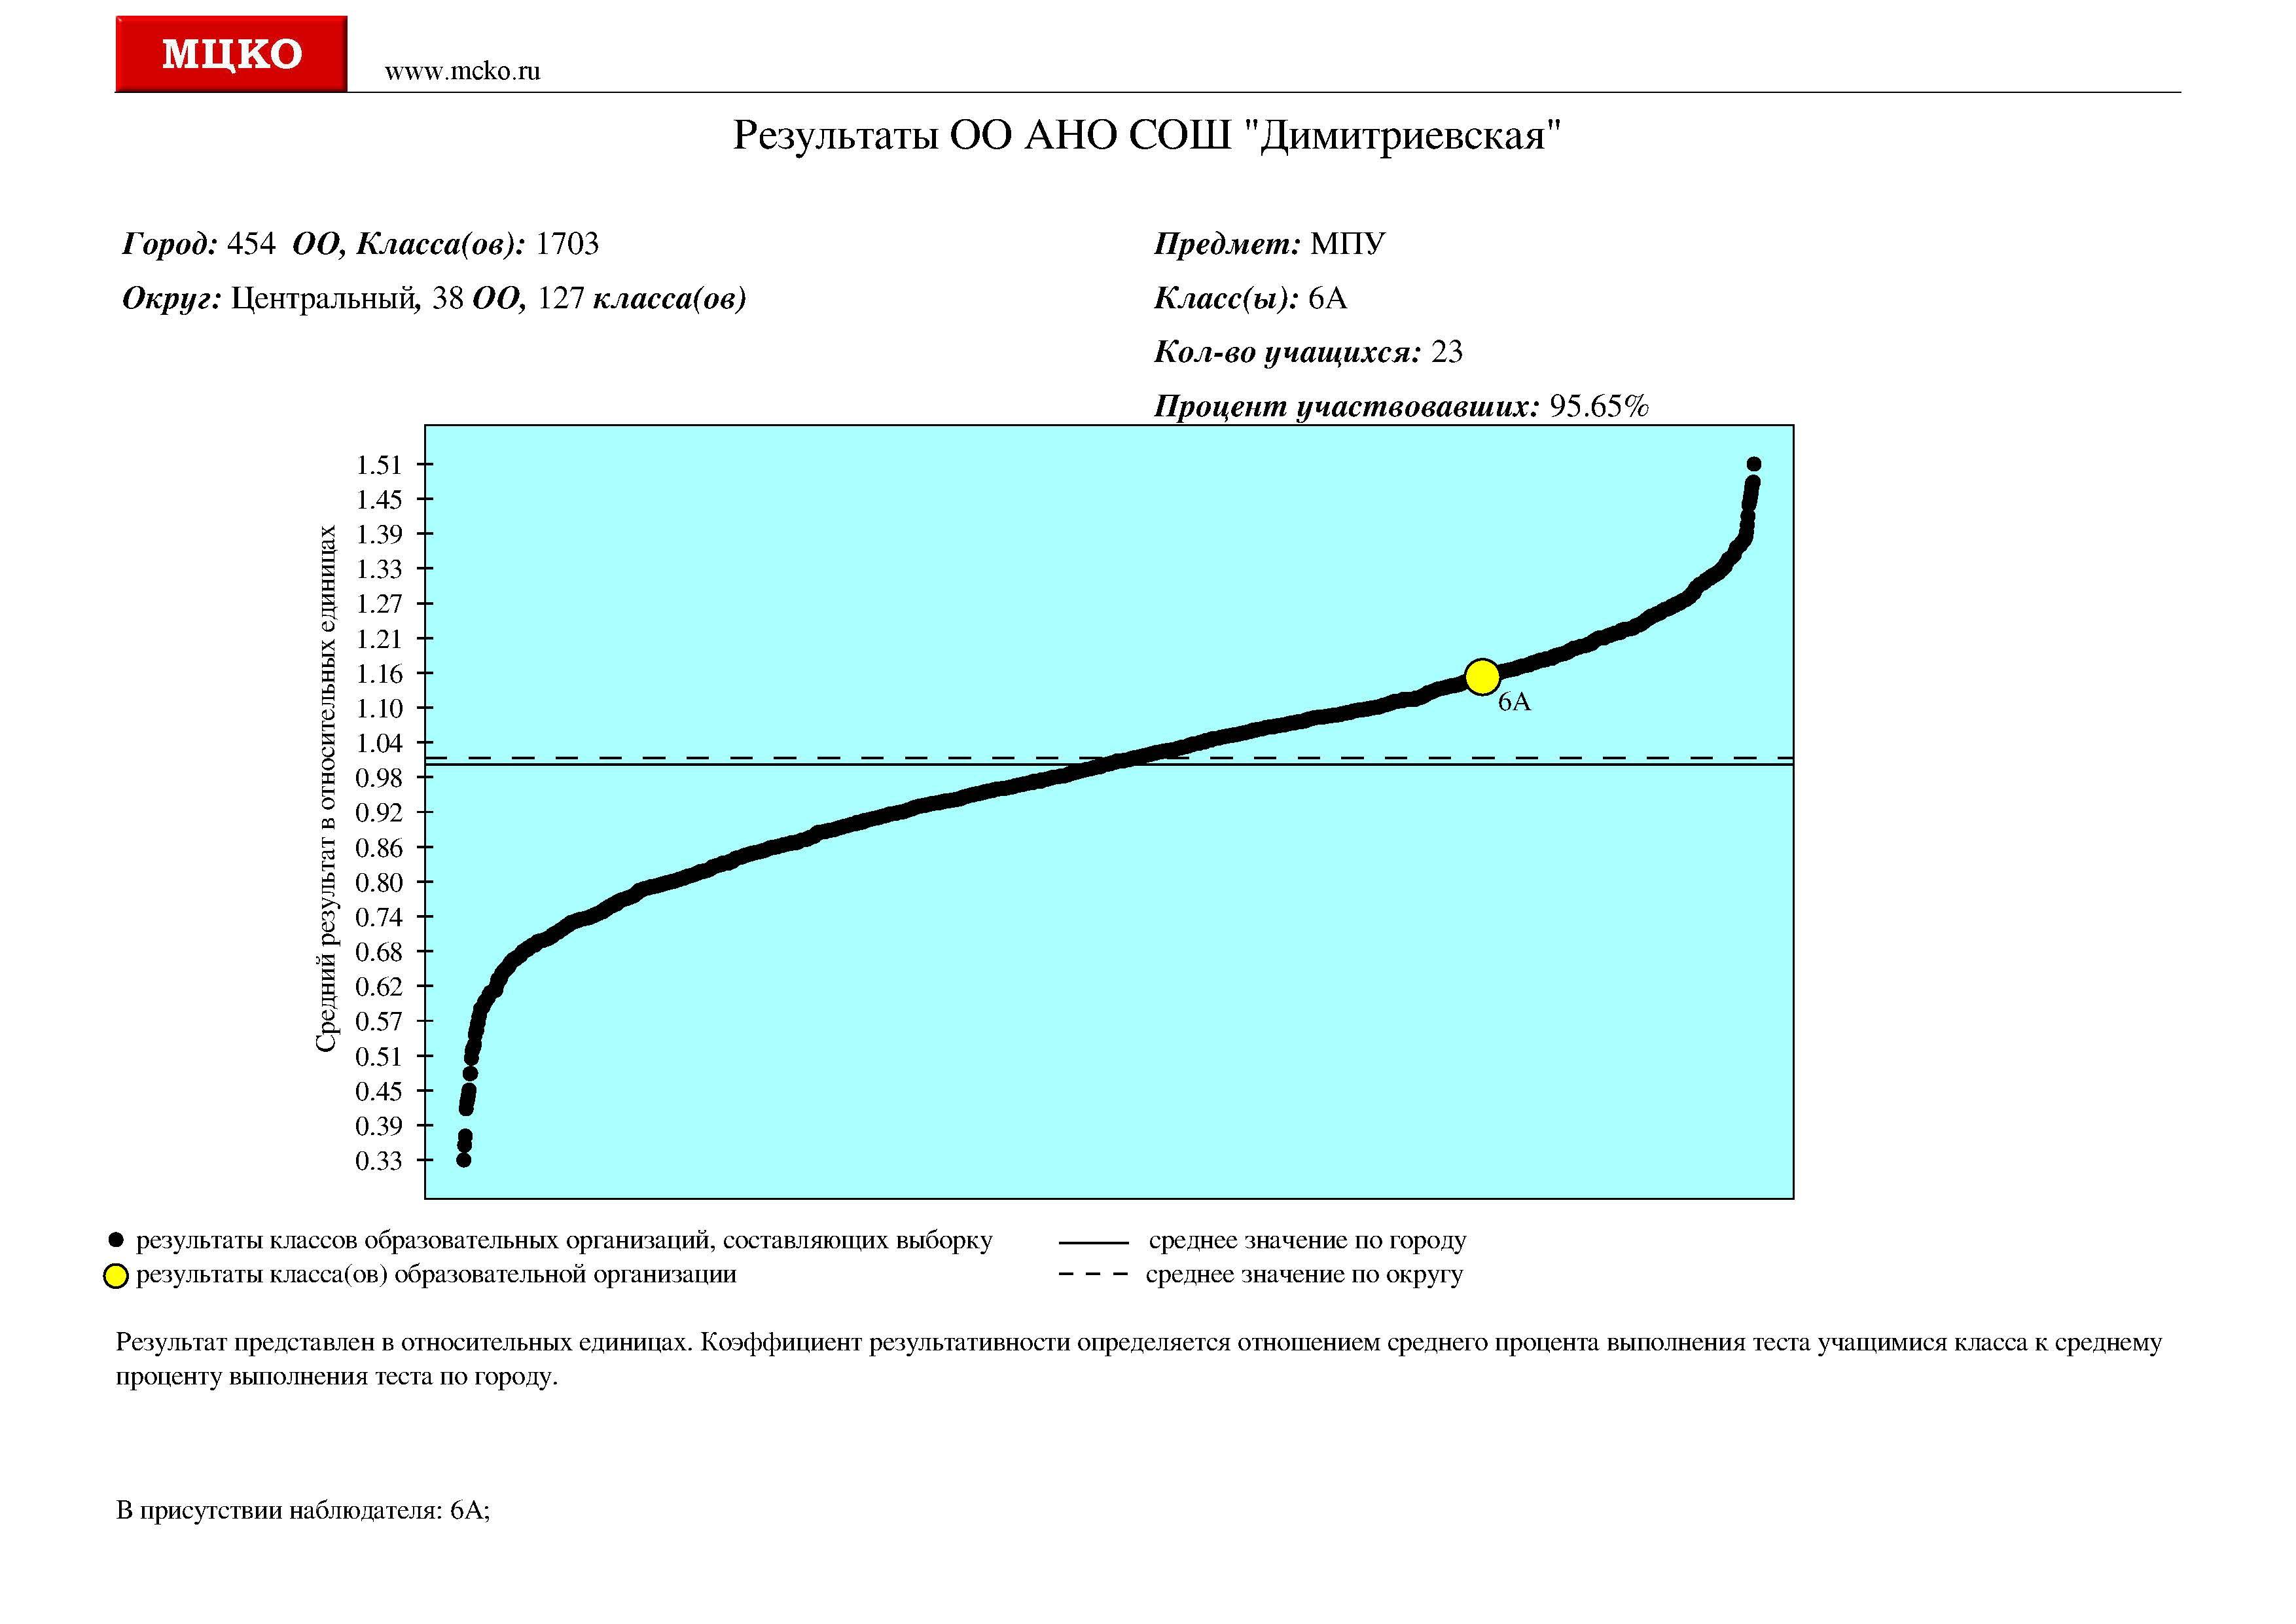 graph_9041 (20)